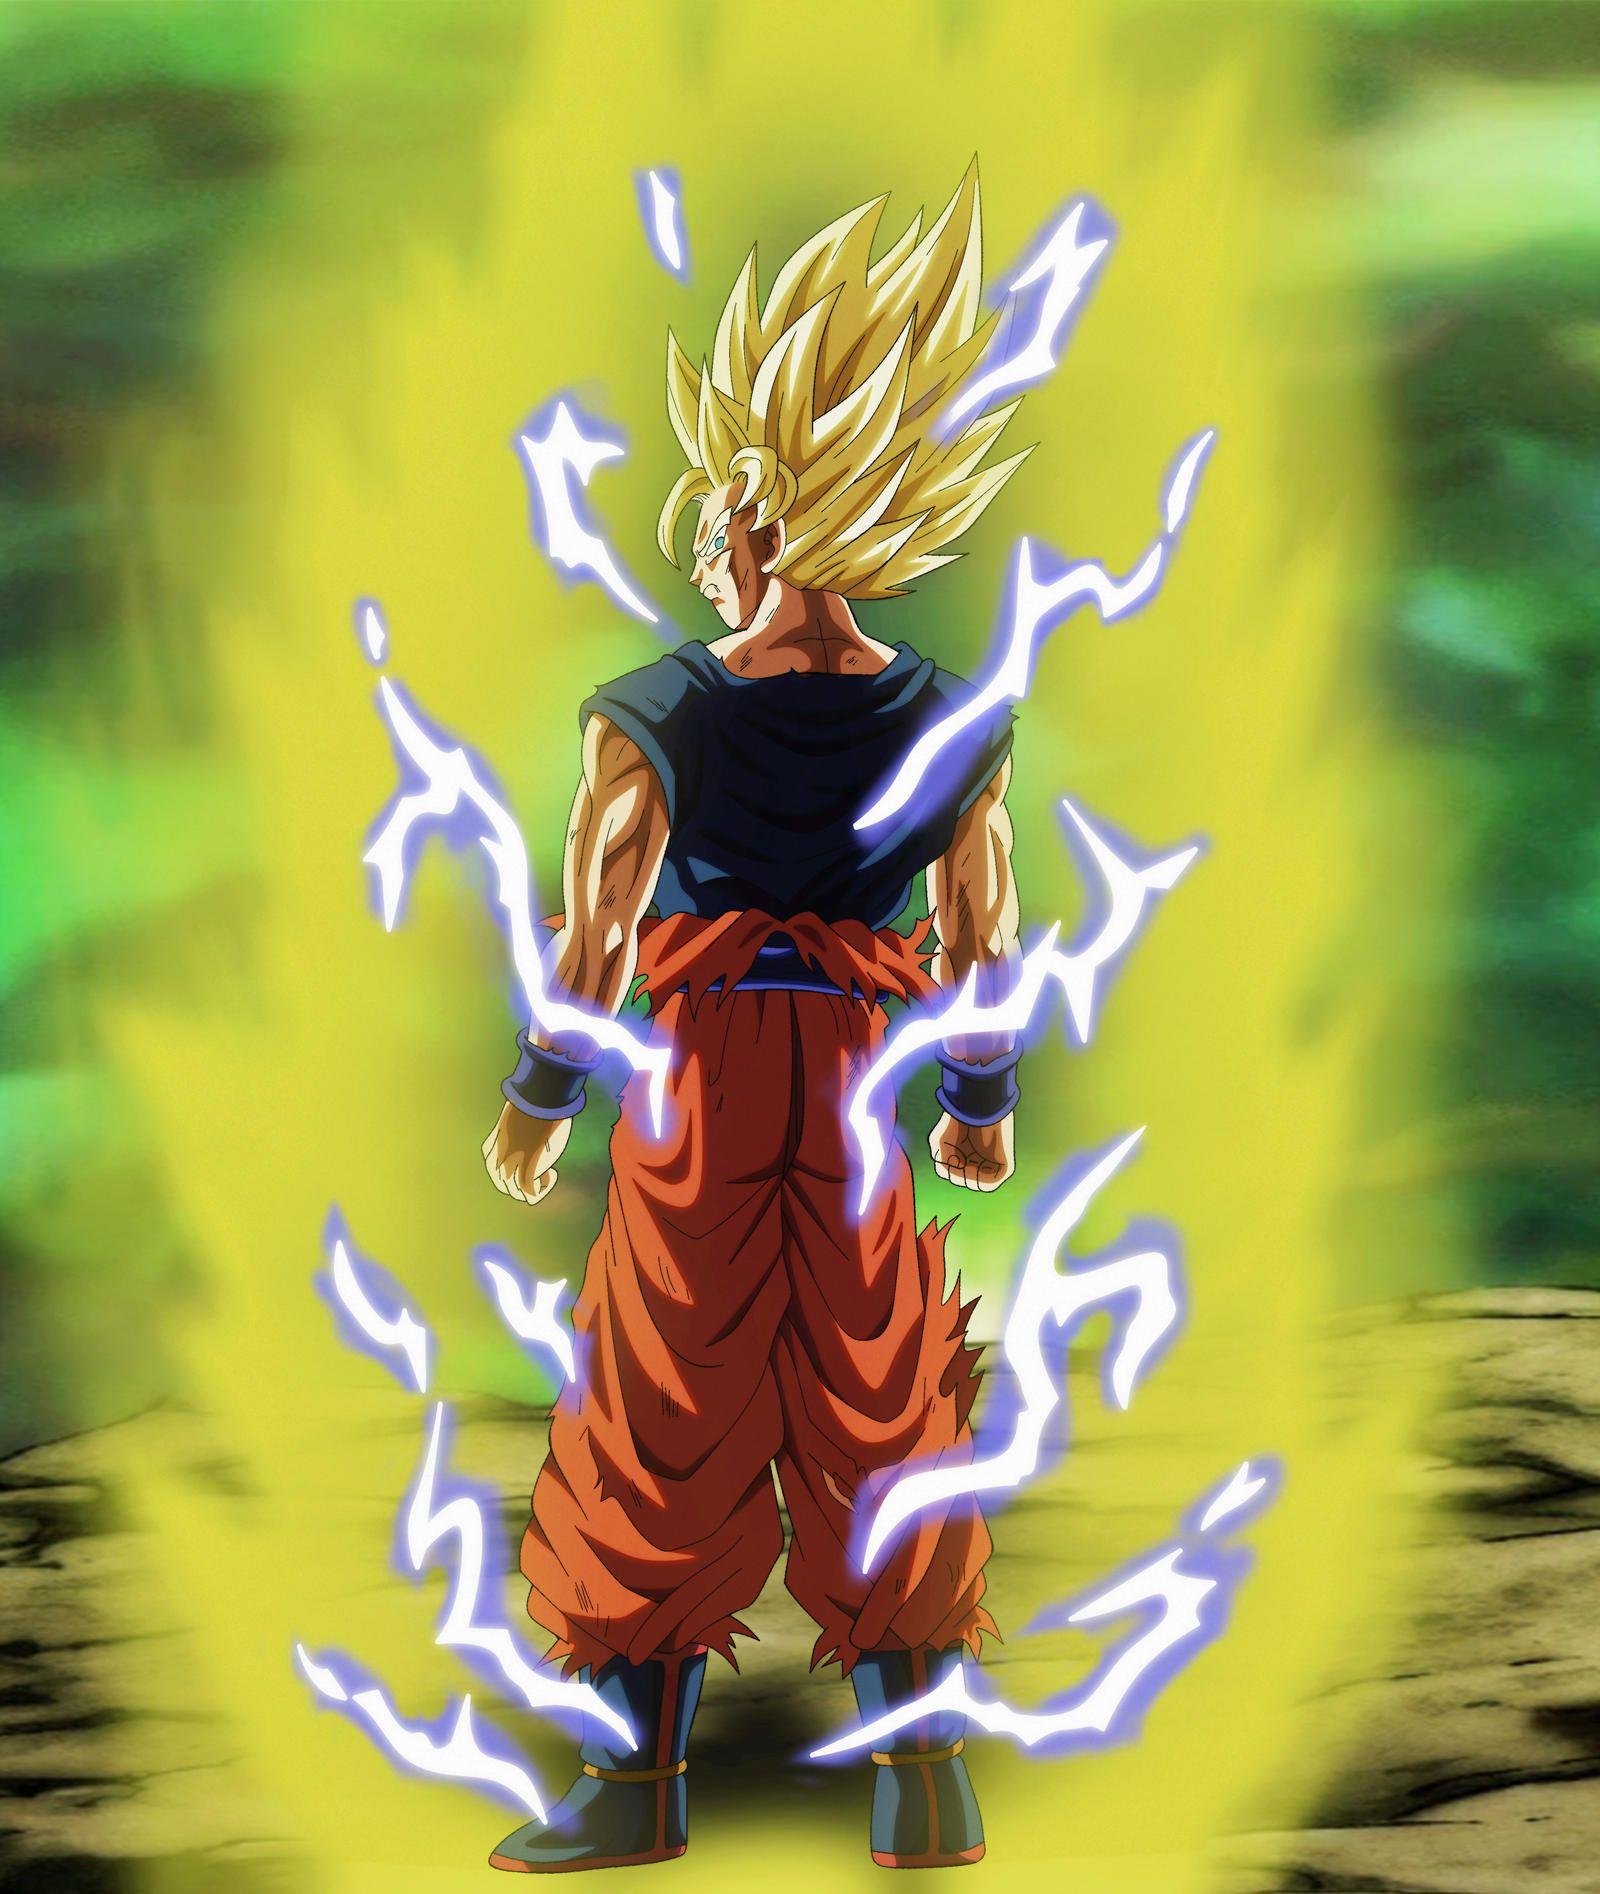 Goku Ssj2 By Andrewdb13 On Deviantart Goku Dragon Ball Z Dragon Ball Super